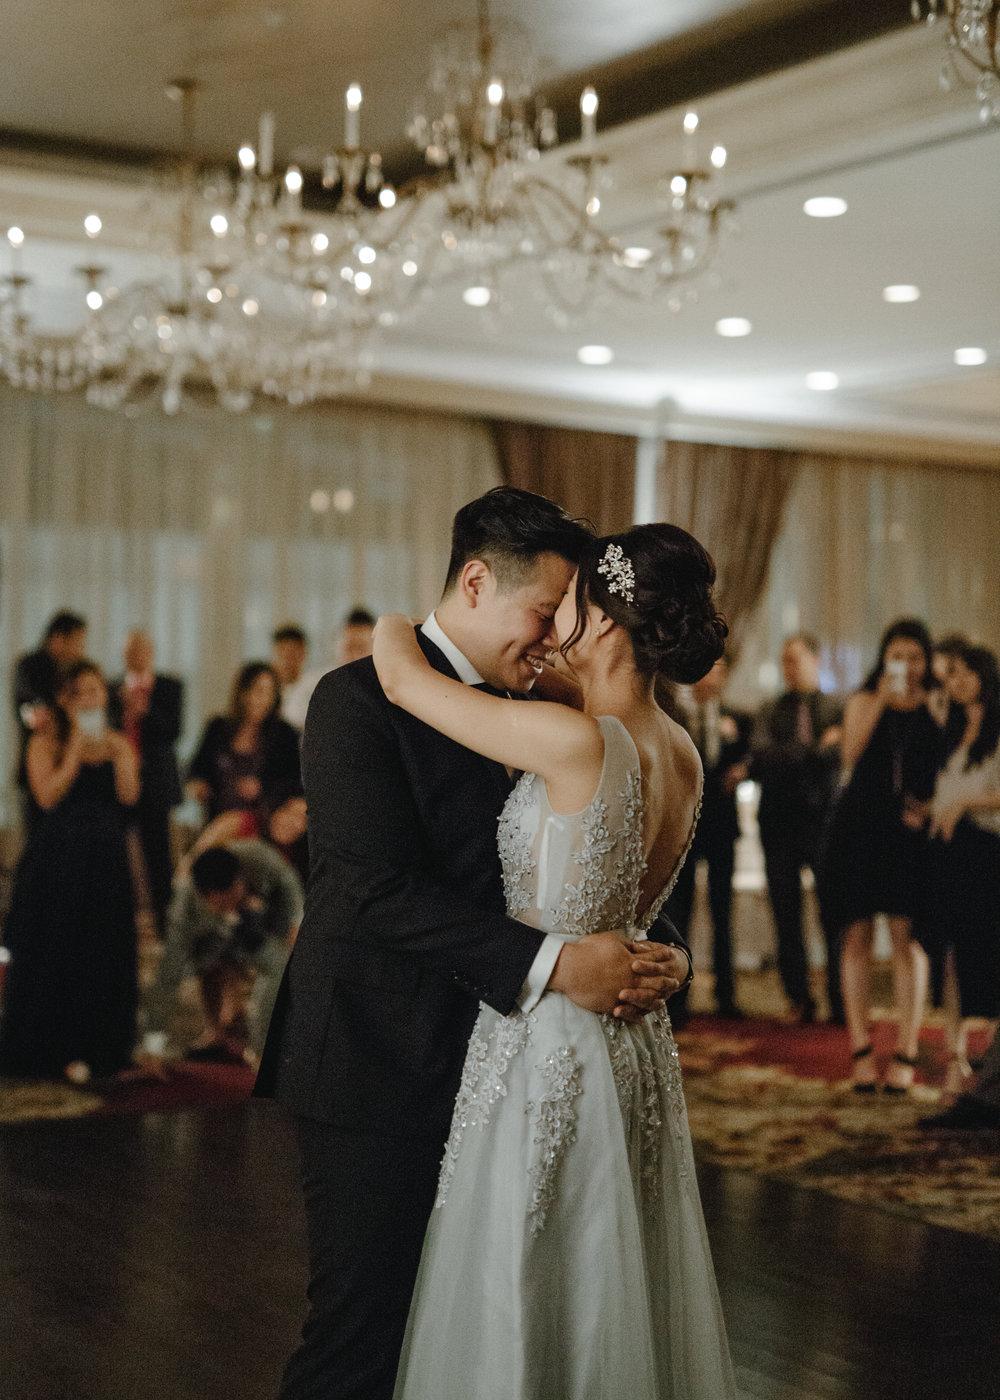 herafilms_wedding_sandy_jon_hera_selects-58.jpg